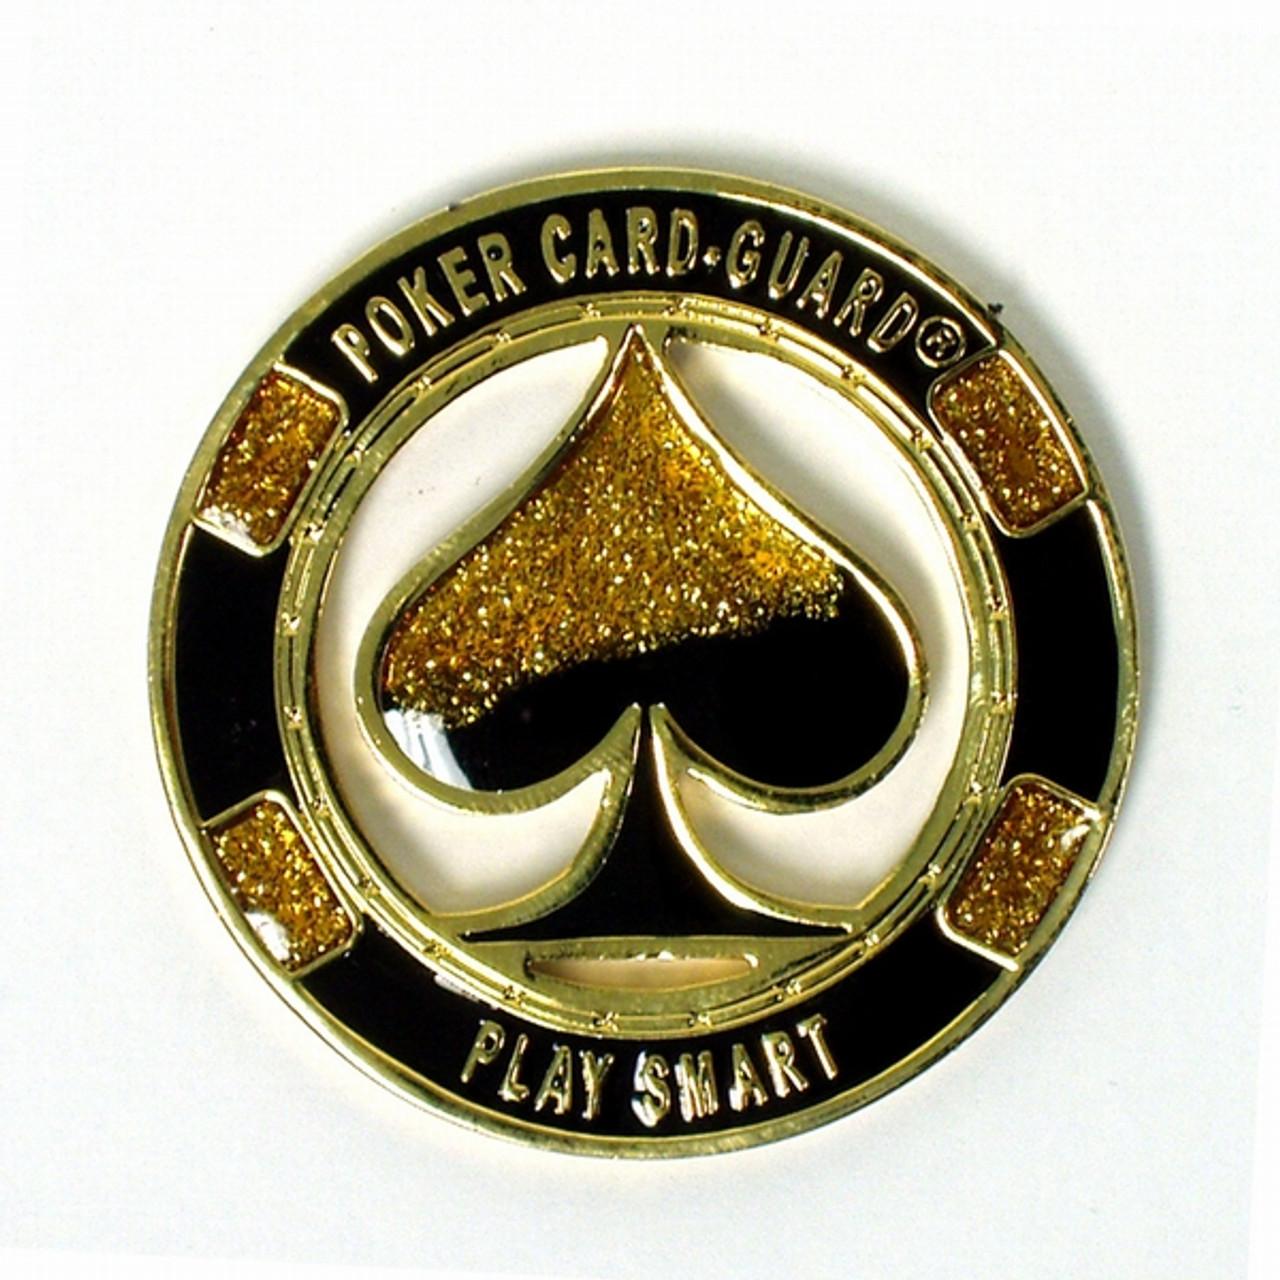 Poker Card Guard - PLAY SMART